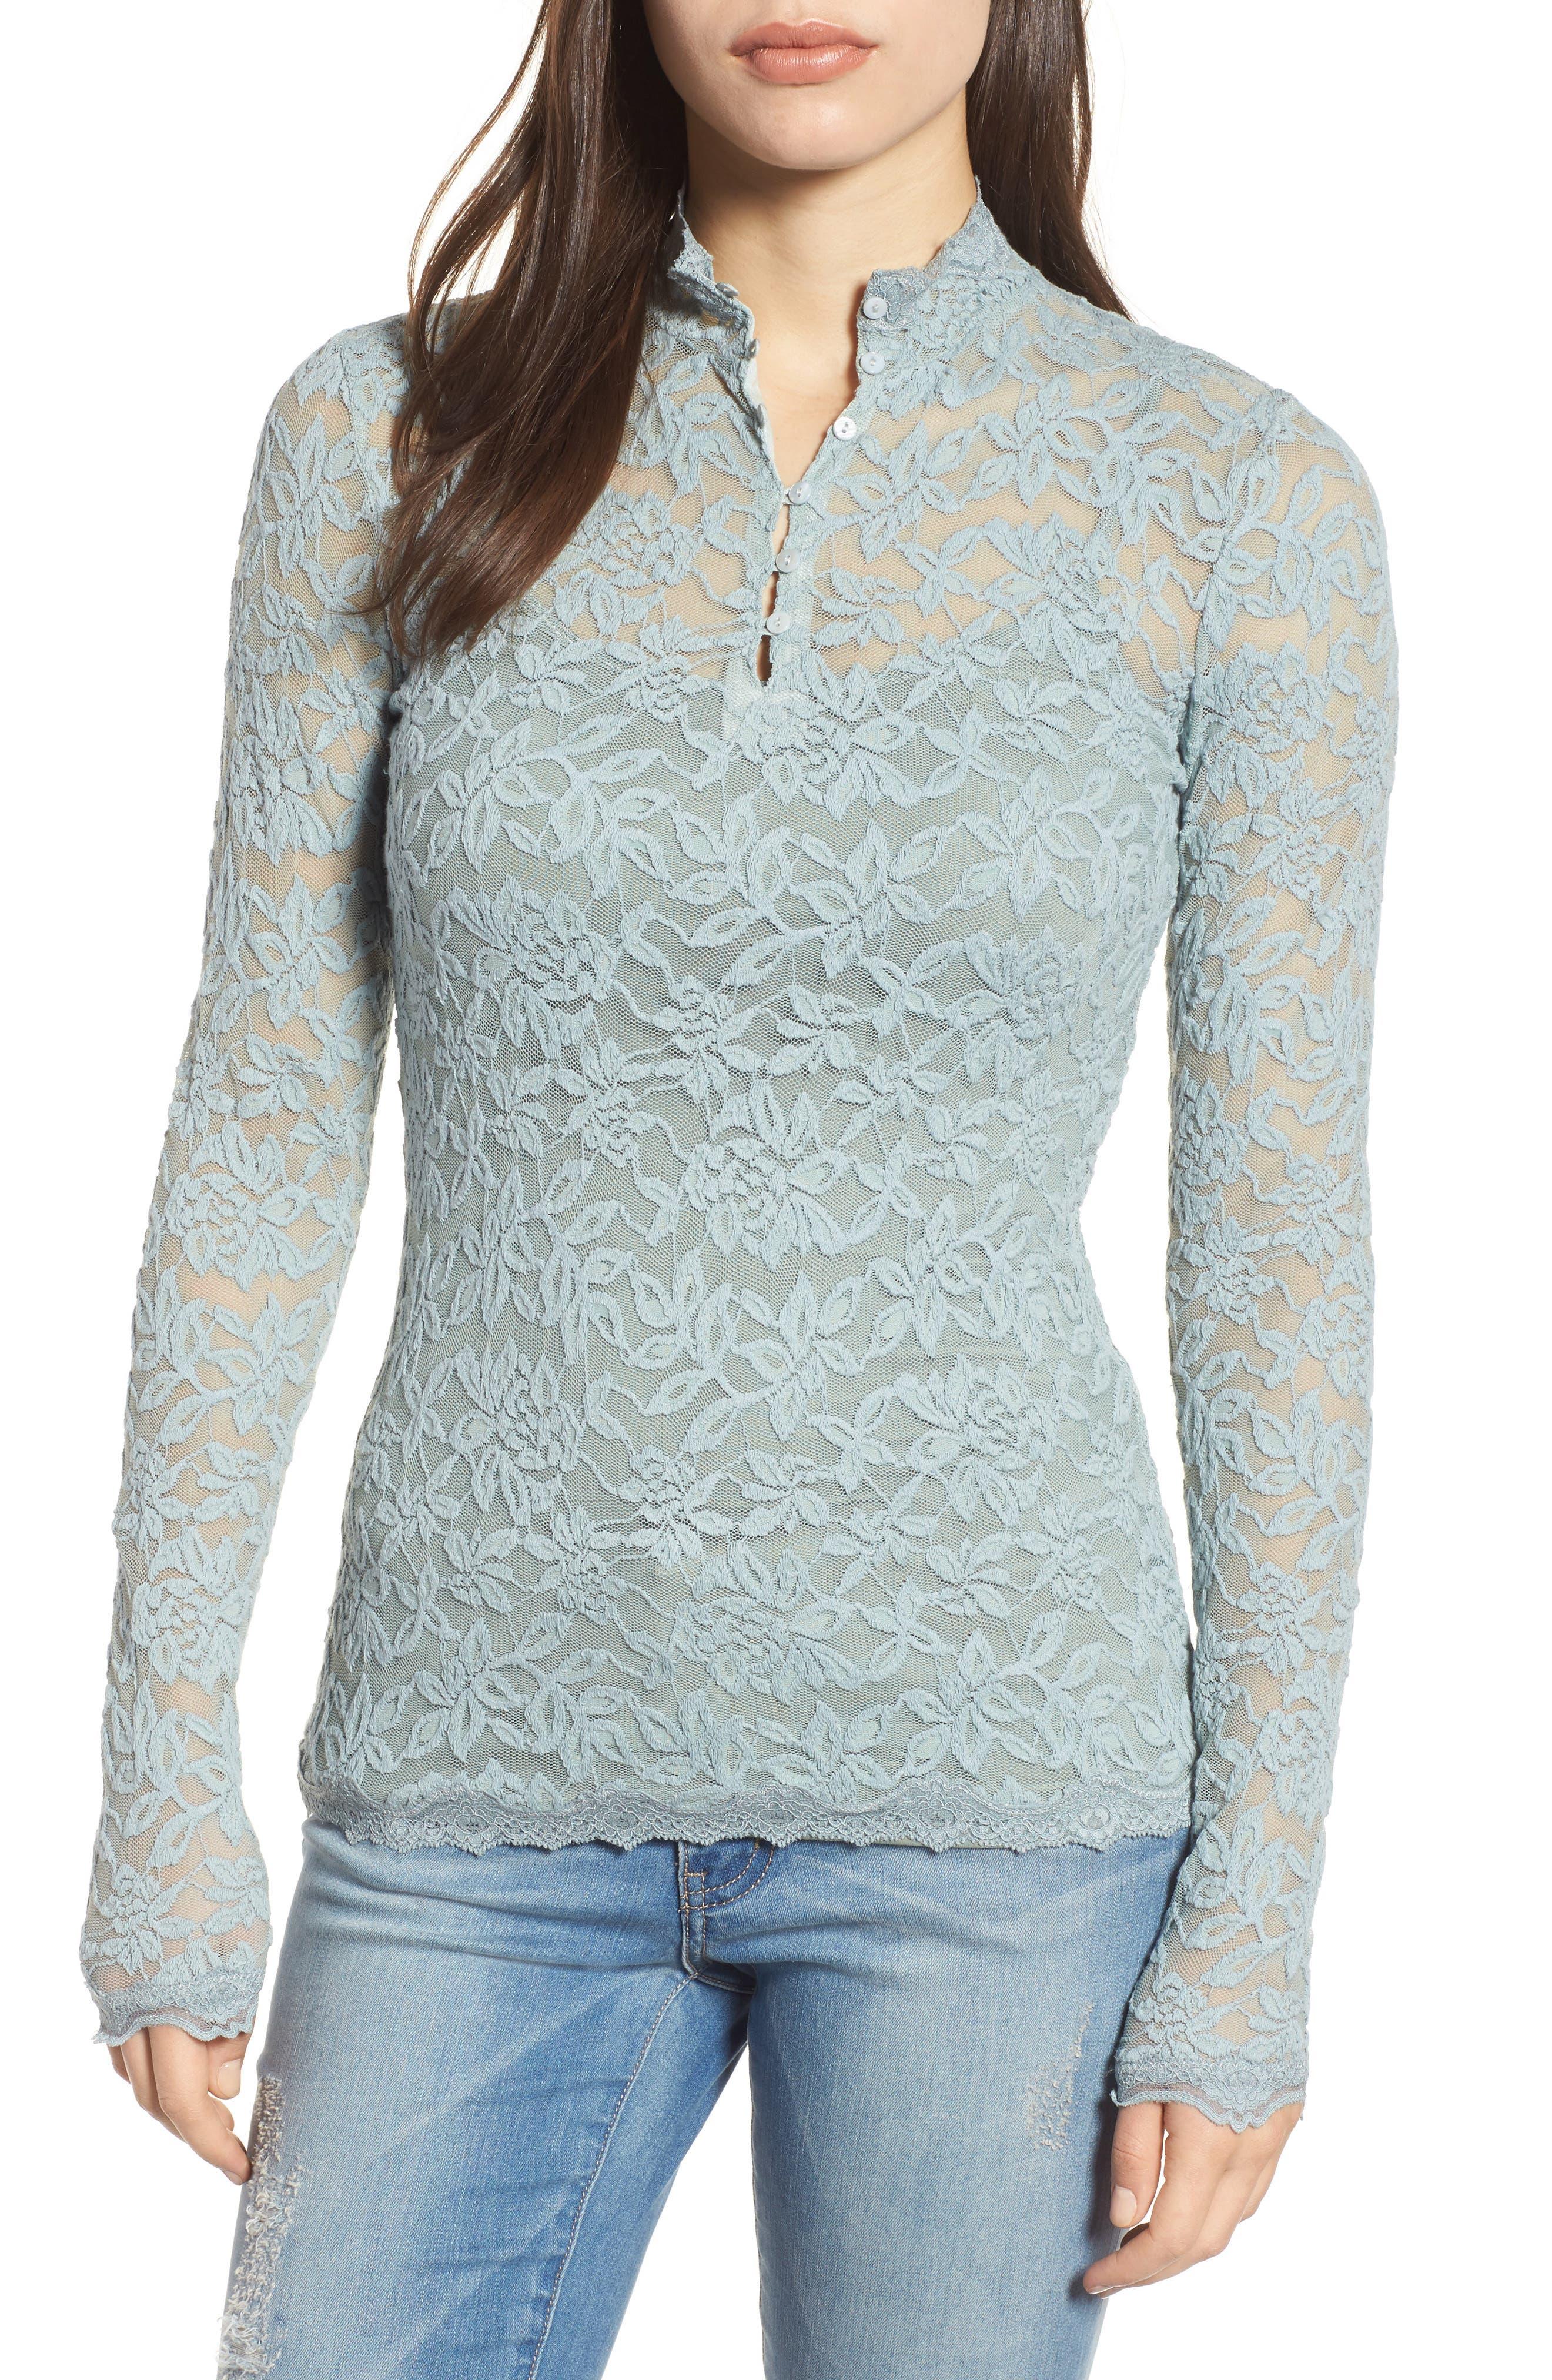 Main Image - Rosemunde Delicia Long Sleeve Top